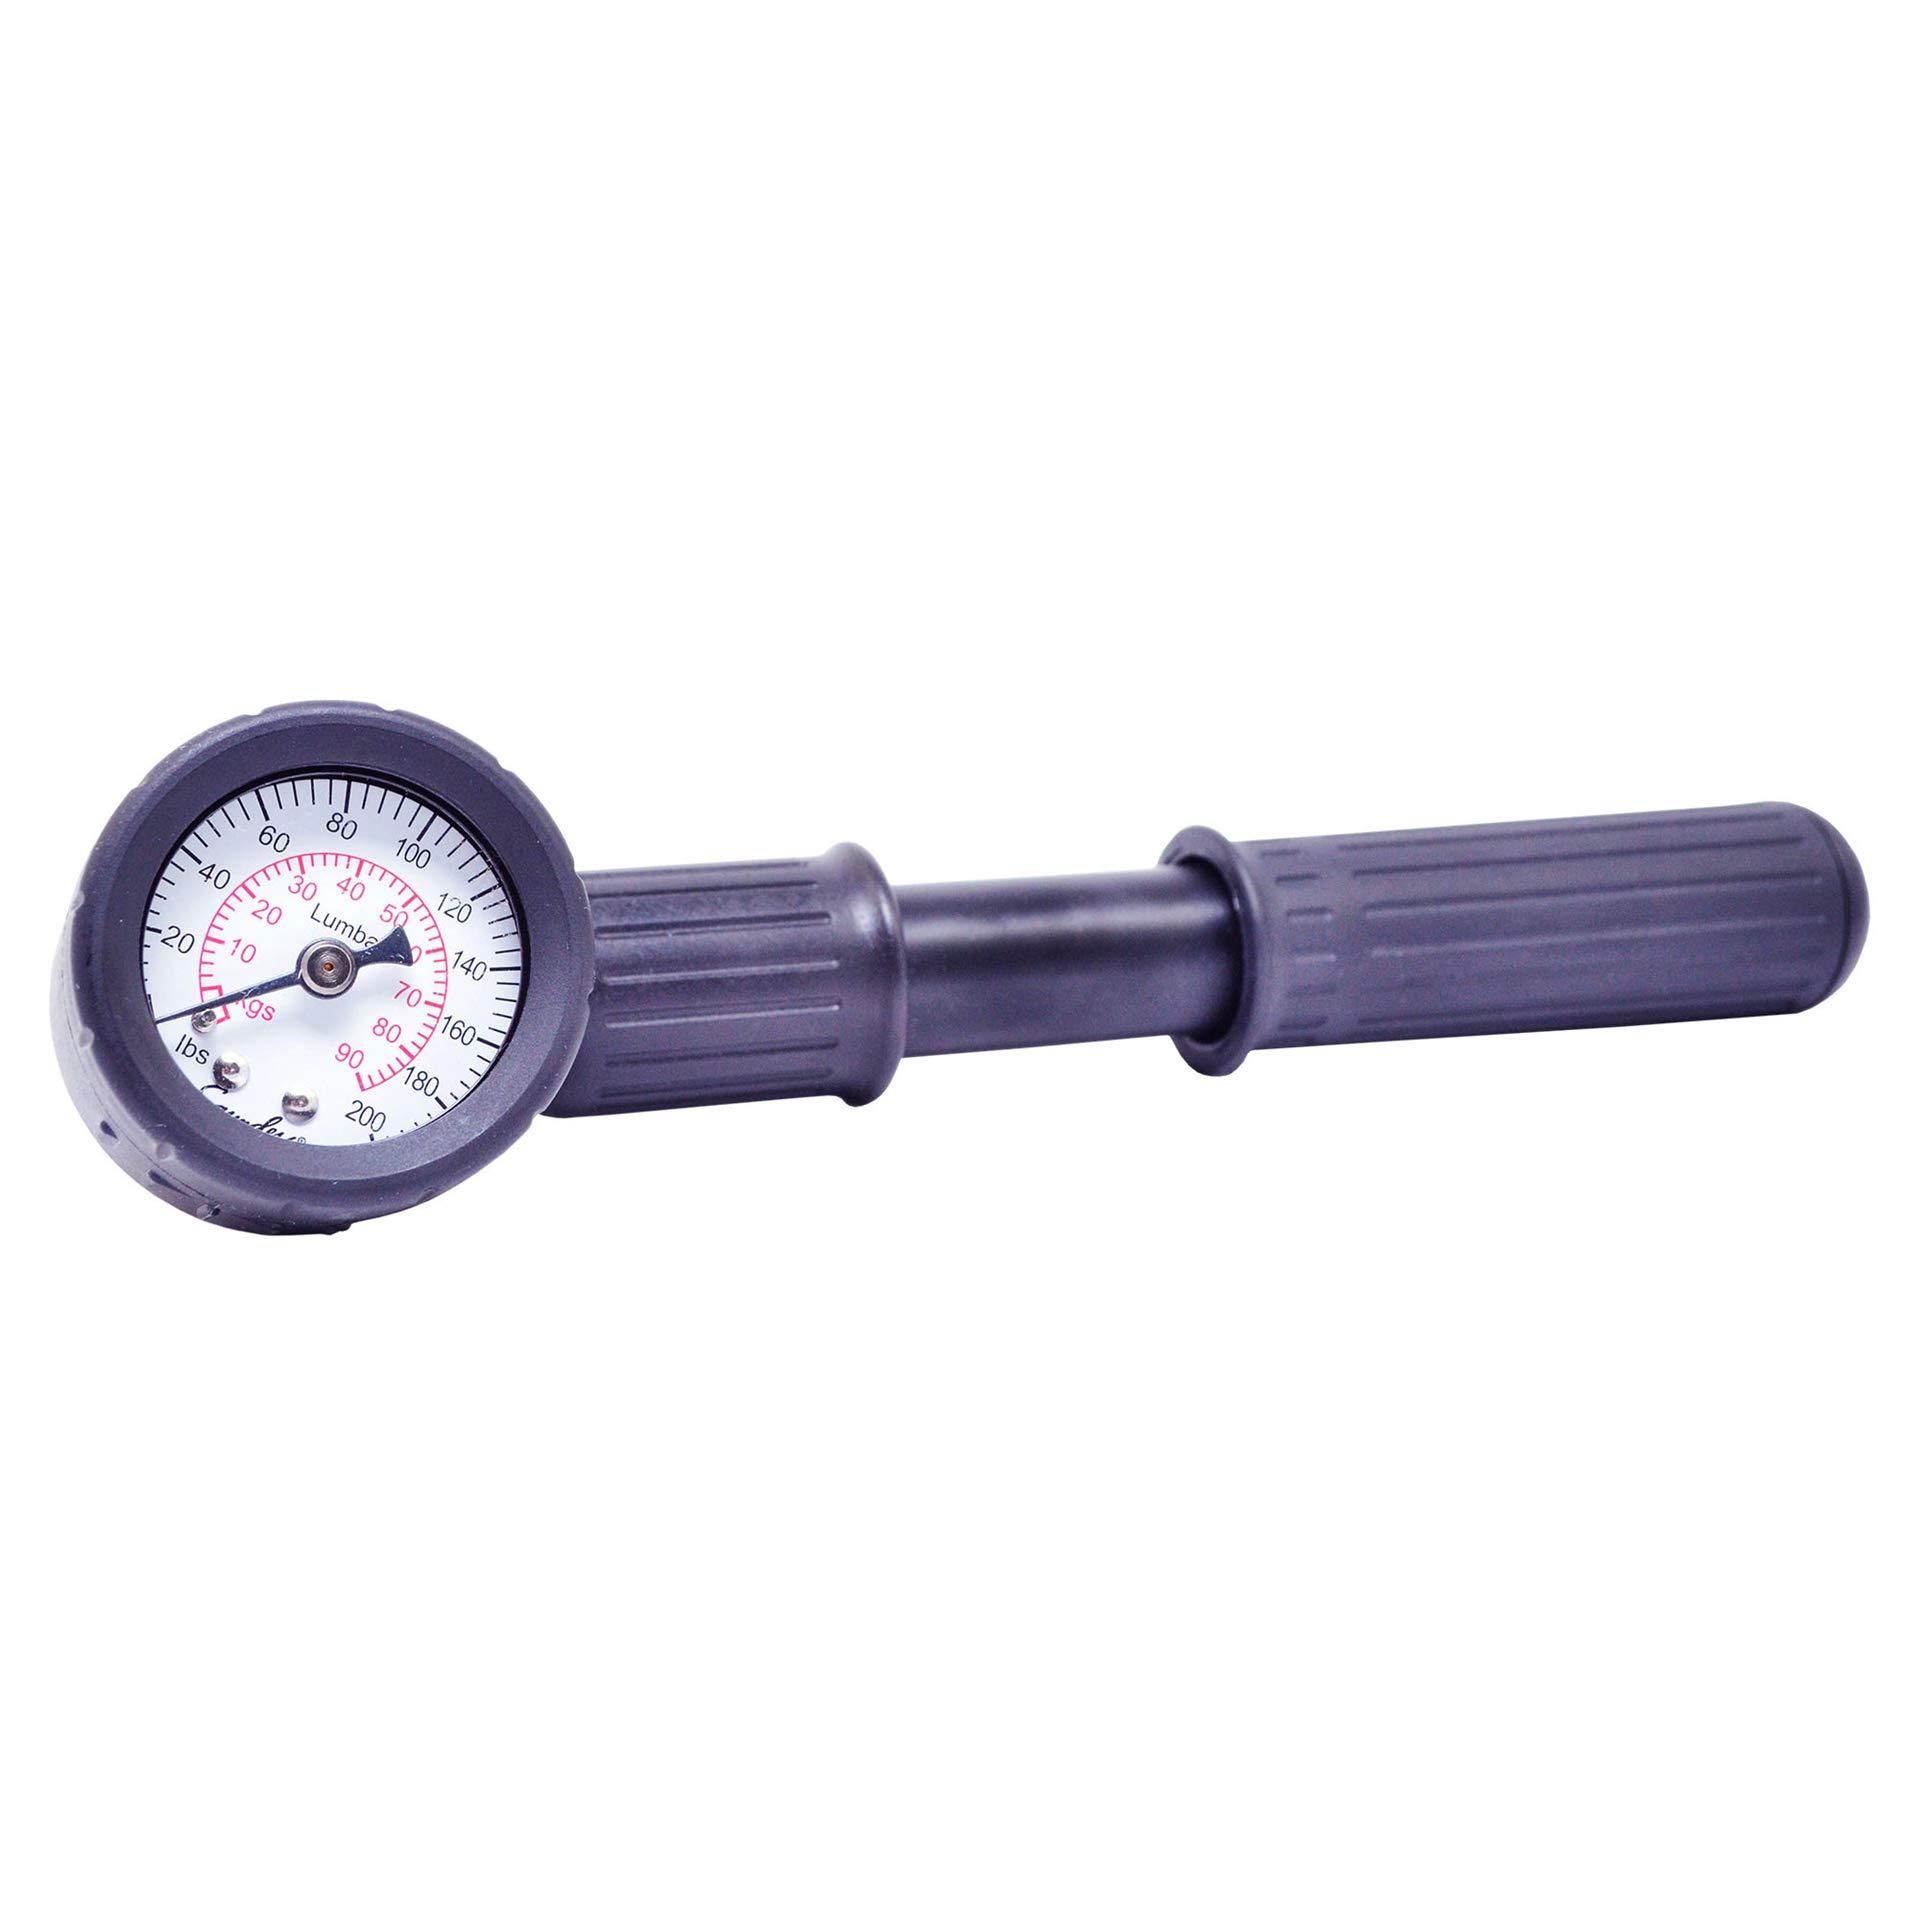 Saunders Traction Kit - Replacement Lumbar Hand Pump